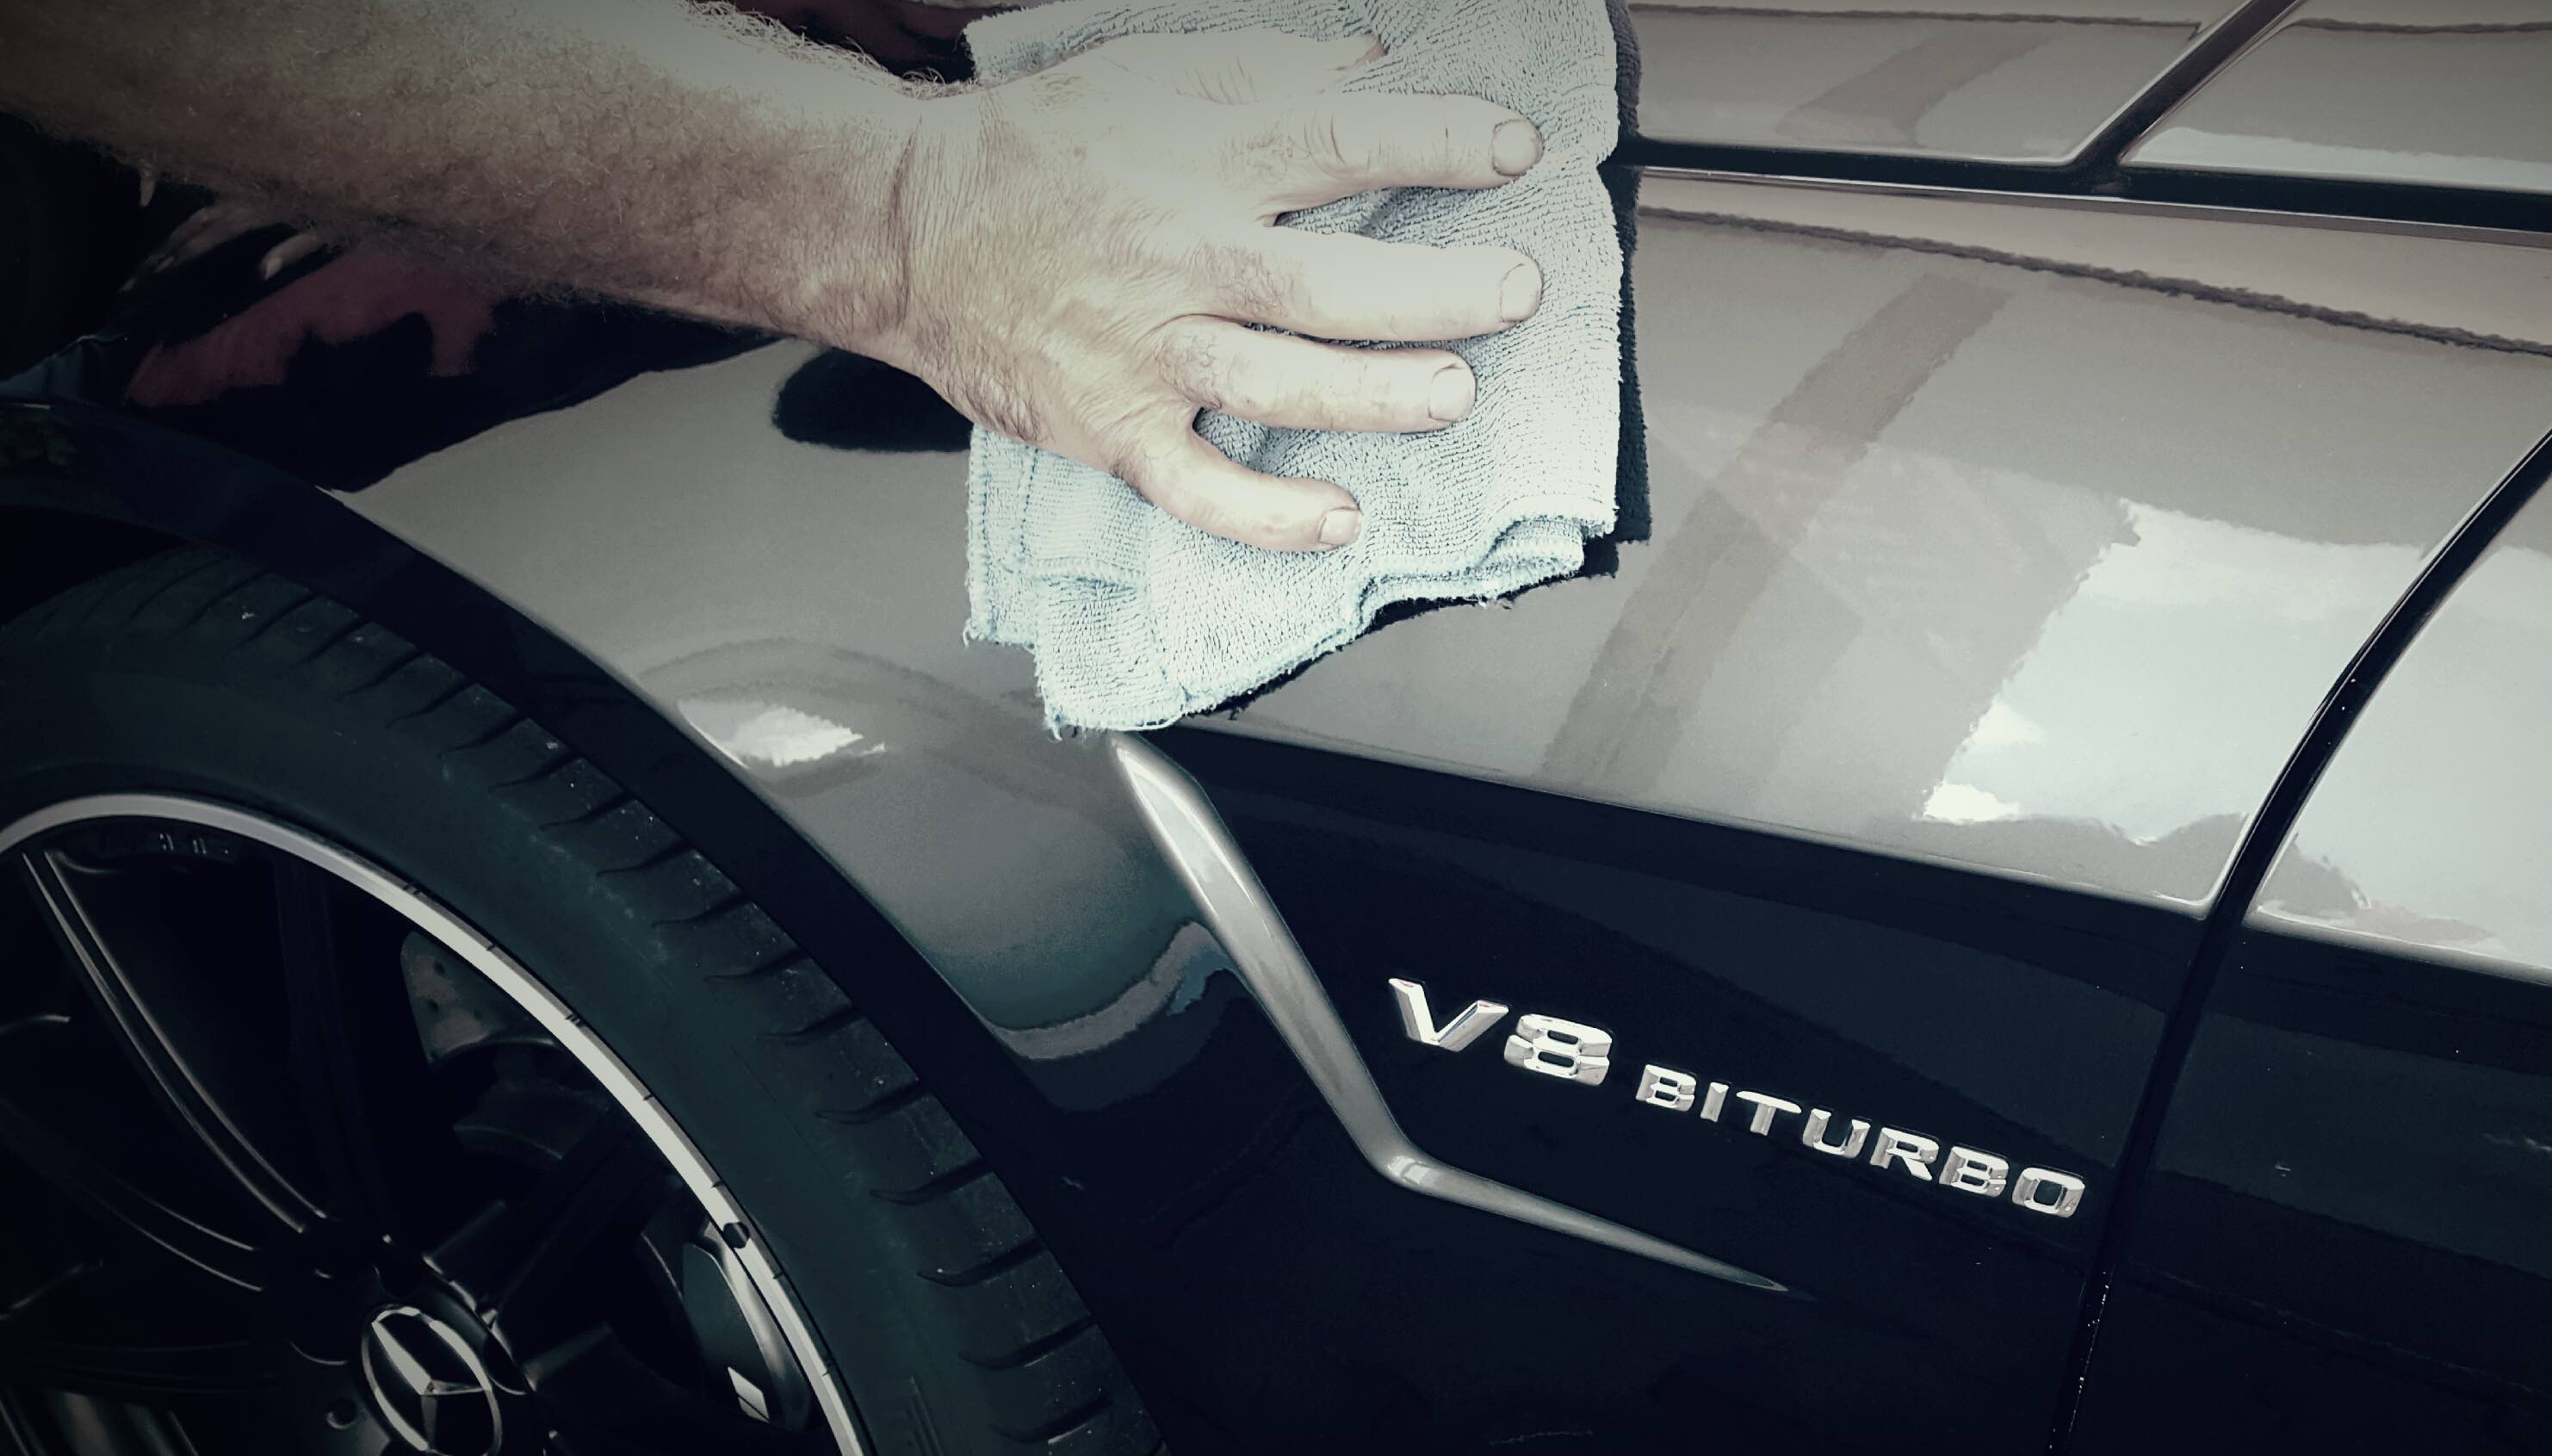 V8 Biturbo - Hand Politur